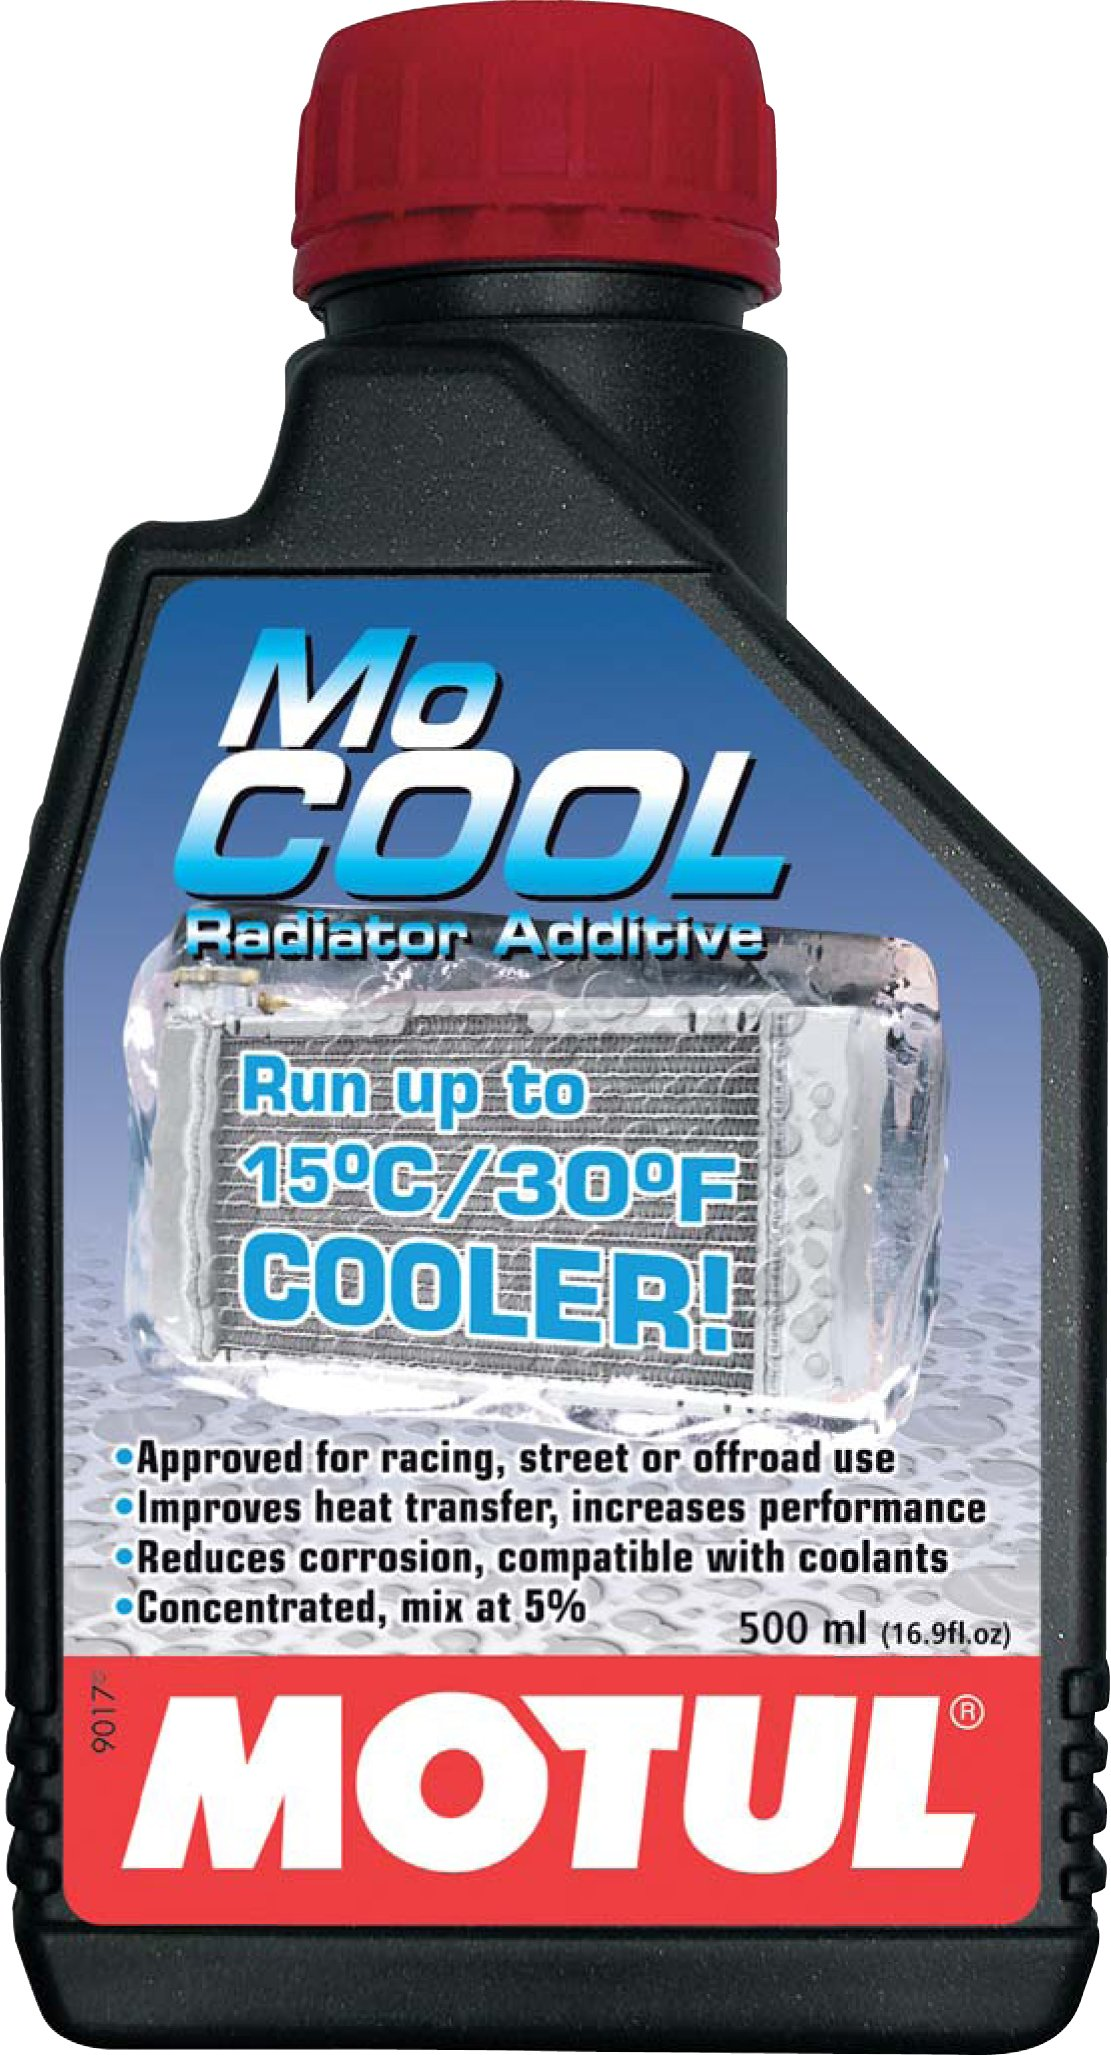 Motul 847405-12PK Mocool Radiator Additive - 500 ml, (Case Pack of 12) by Motul